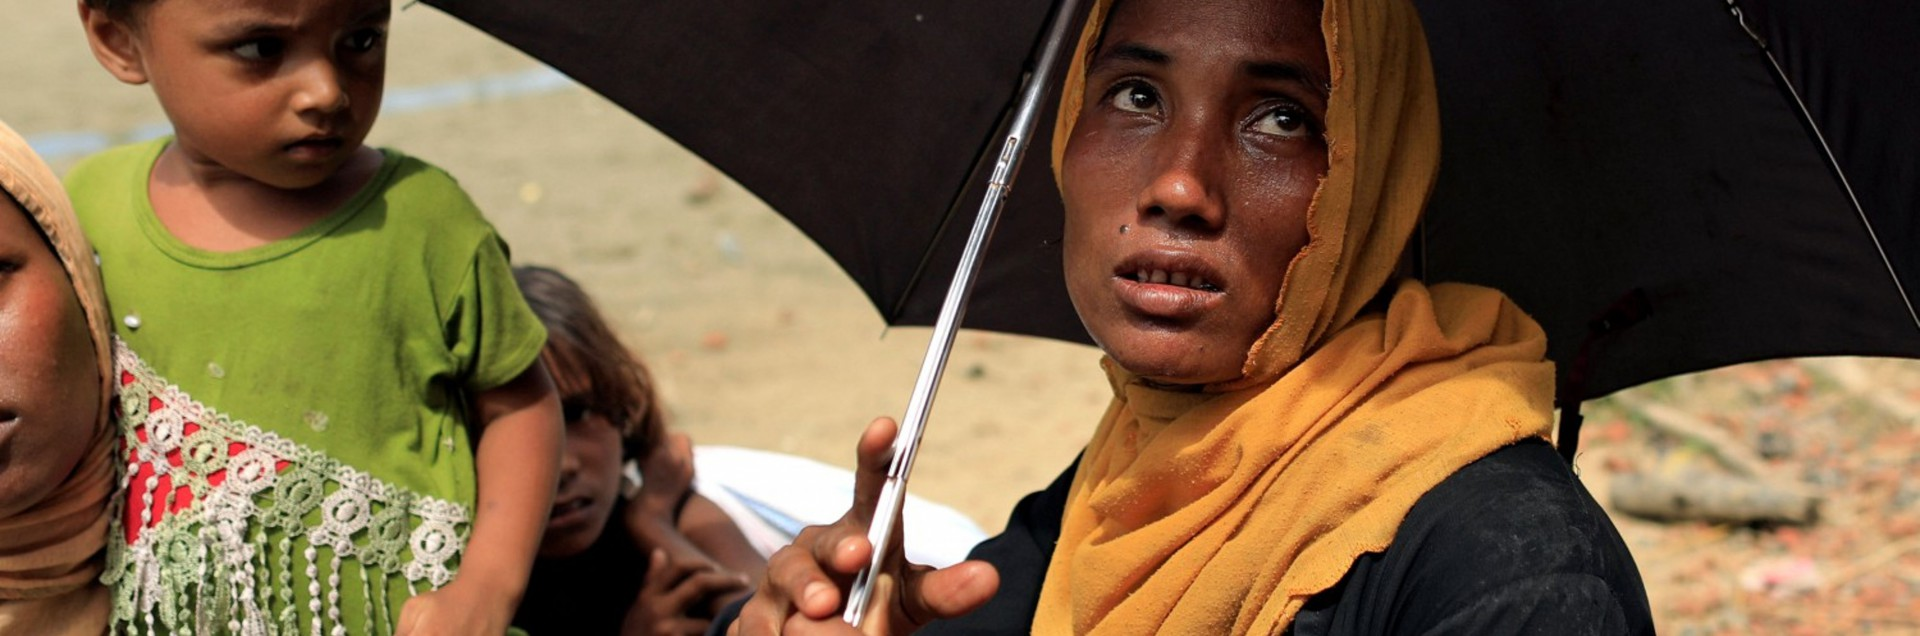 La vera origine dei Rohingya